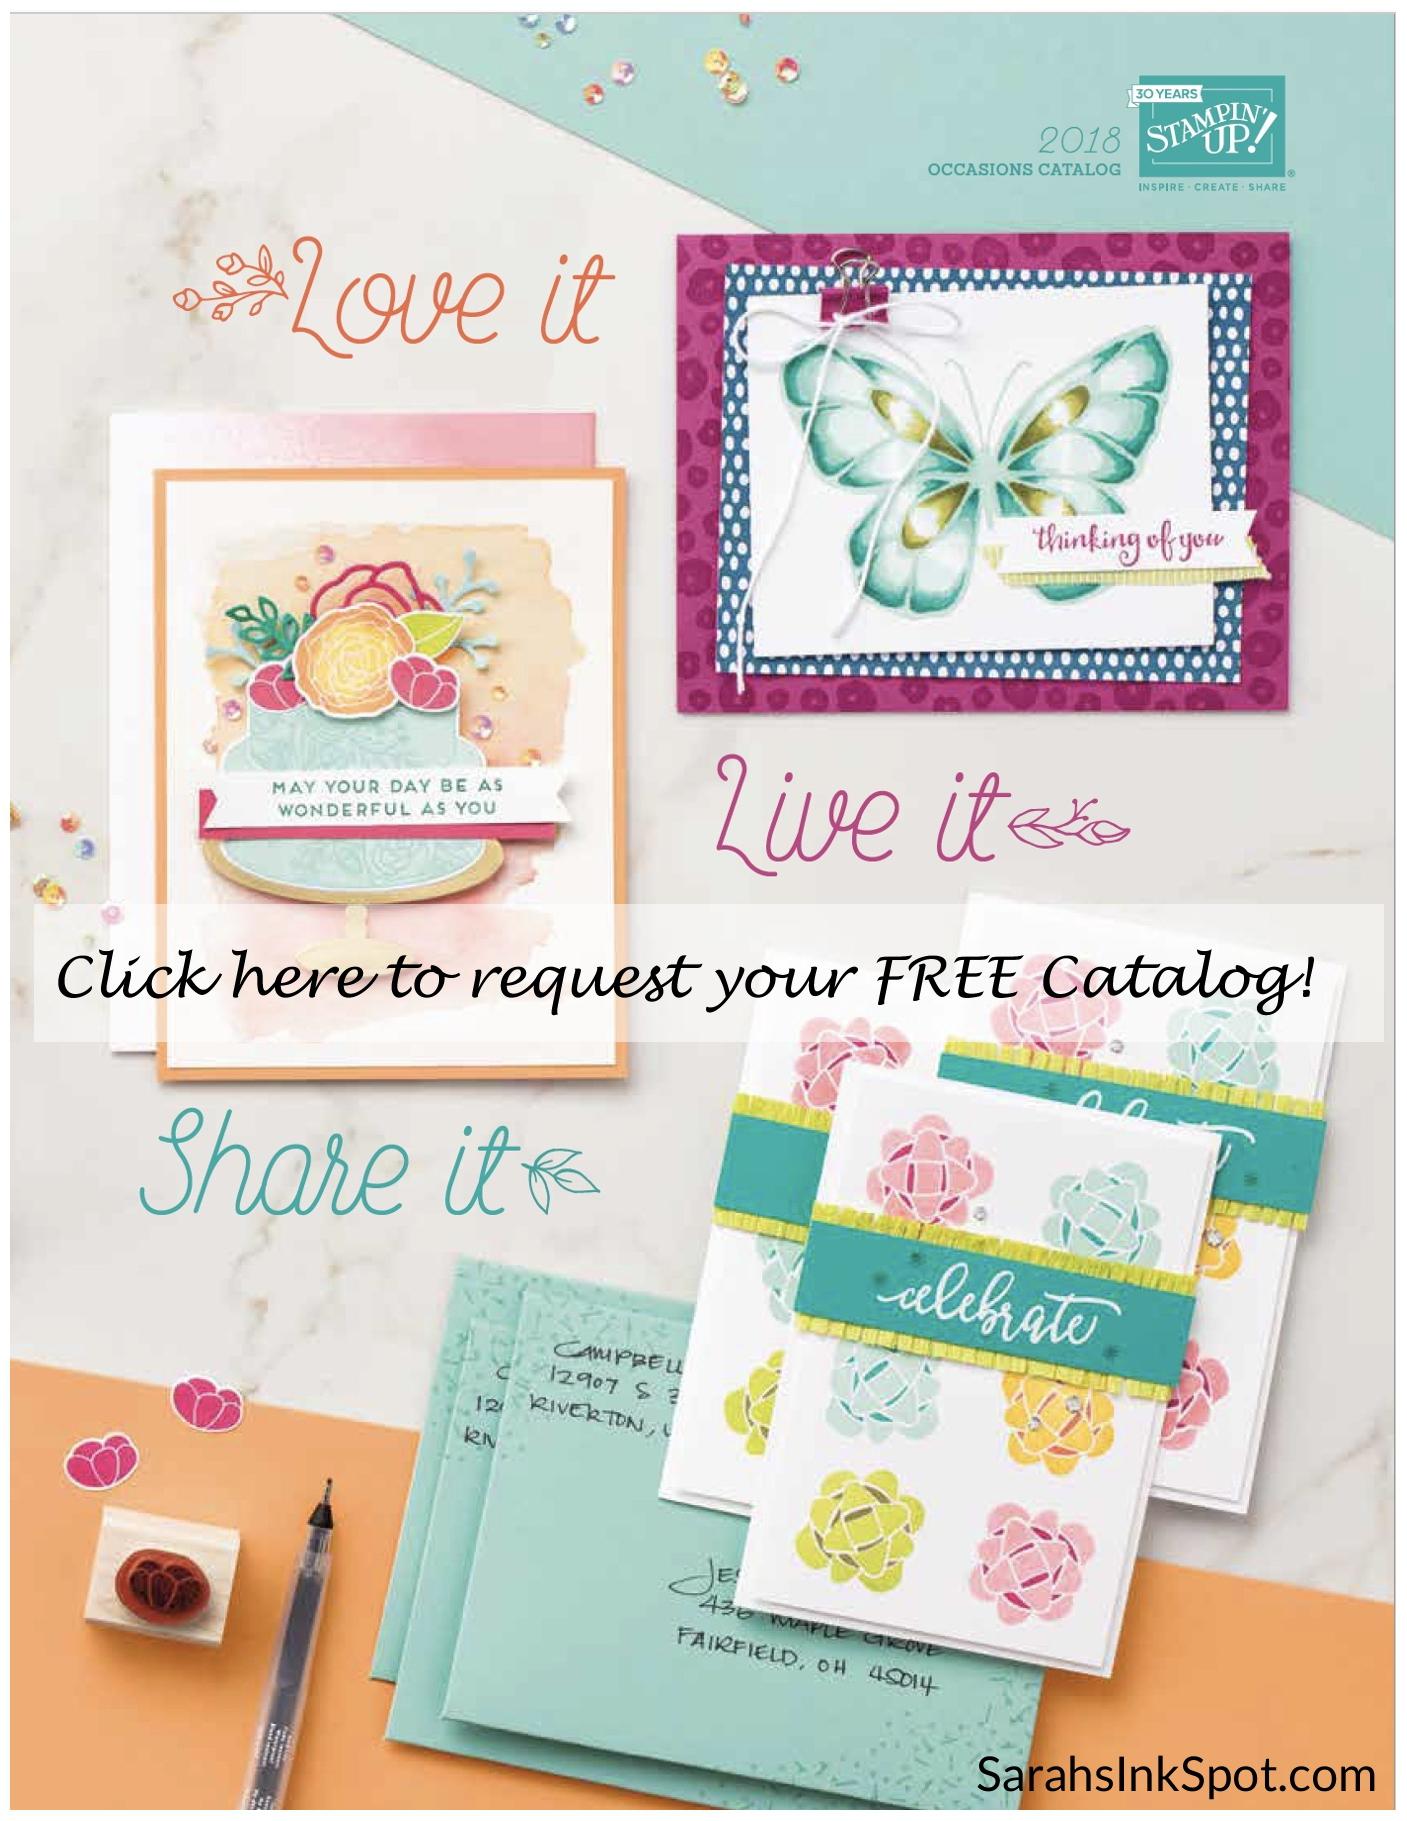 Stampin-Up-Occasions-2018-Spring-Summer-Catalog-Brochure-Sarah-Wills-Order-Sarahsinkspot-Stampinup-148128